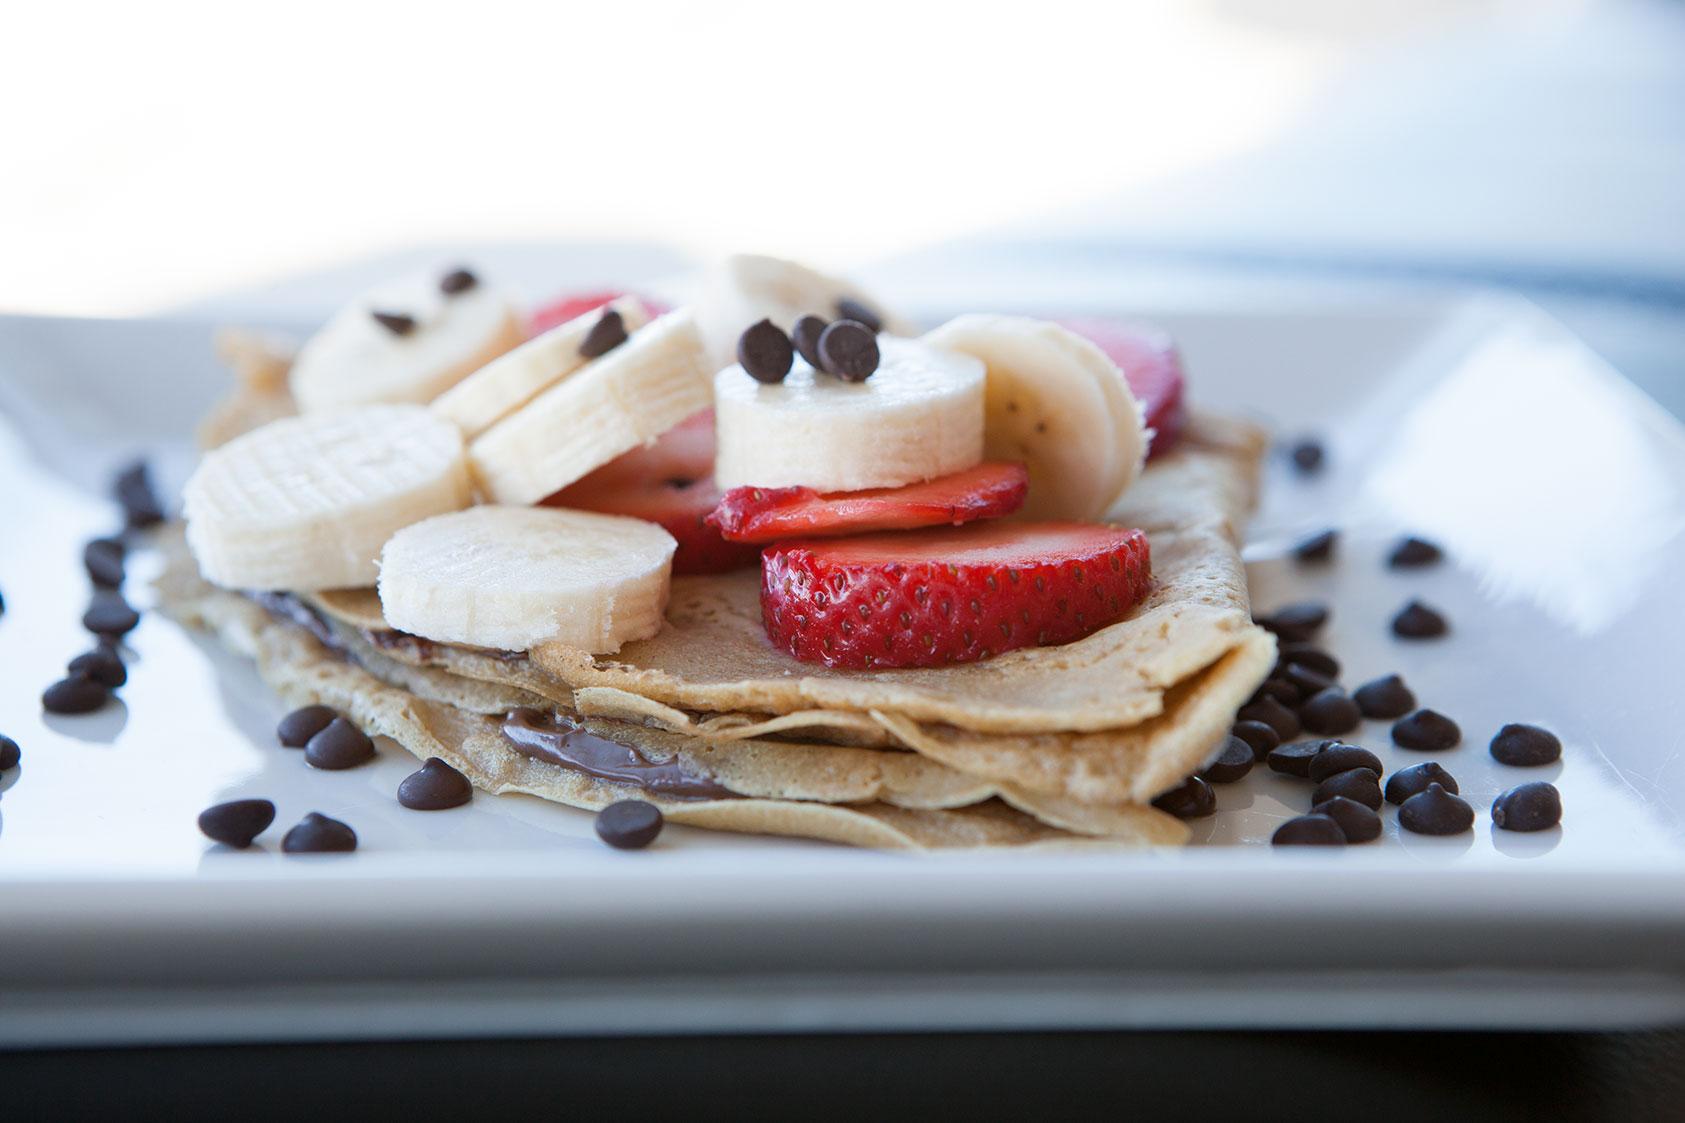 Nutella Strawberry Banana Crepes